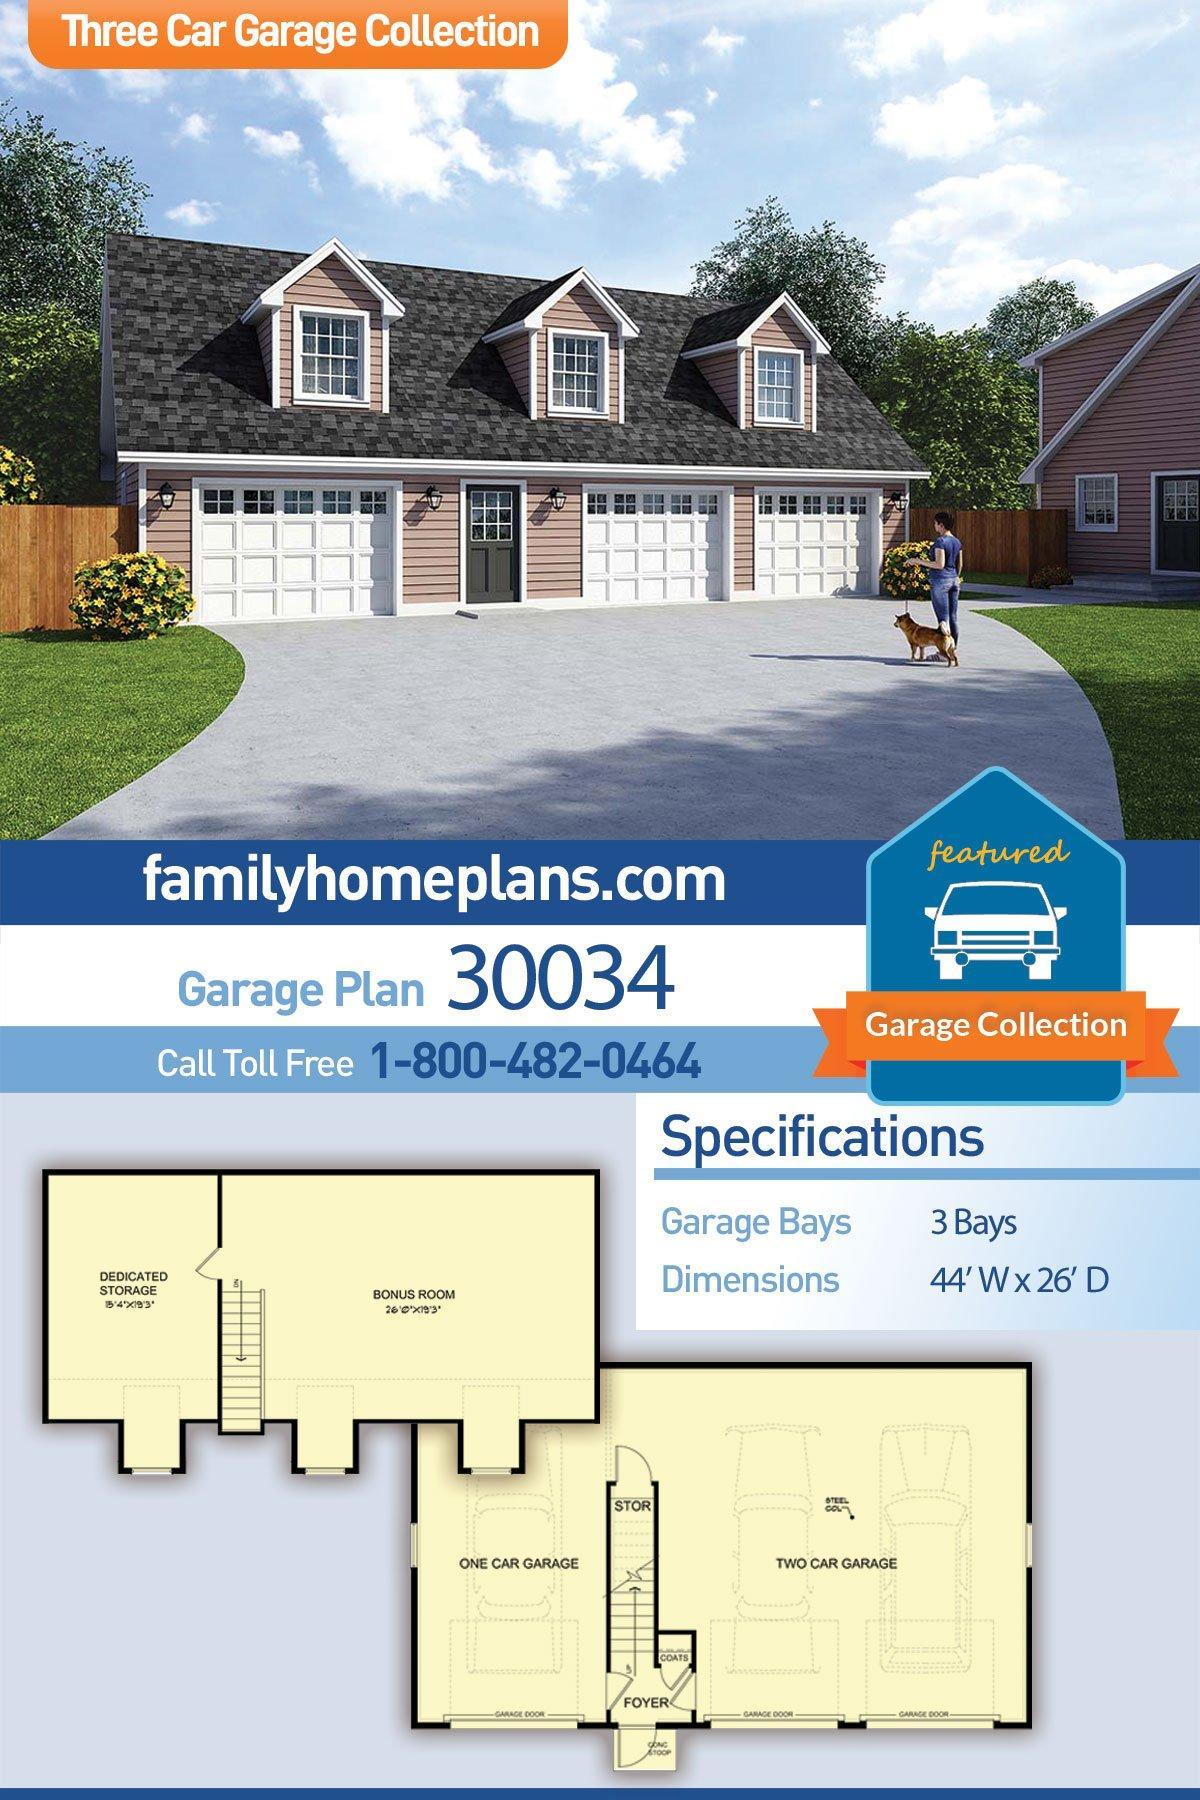 Cape Cod, Saltbox, Traditional 3 Car Garage Apartment Plan 30034